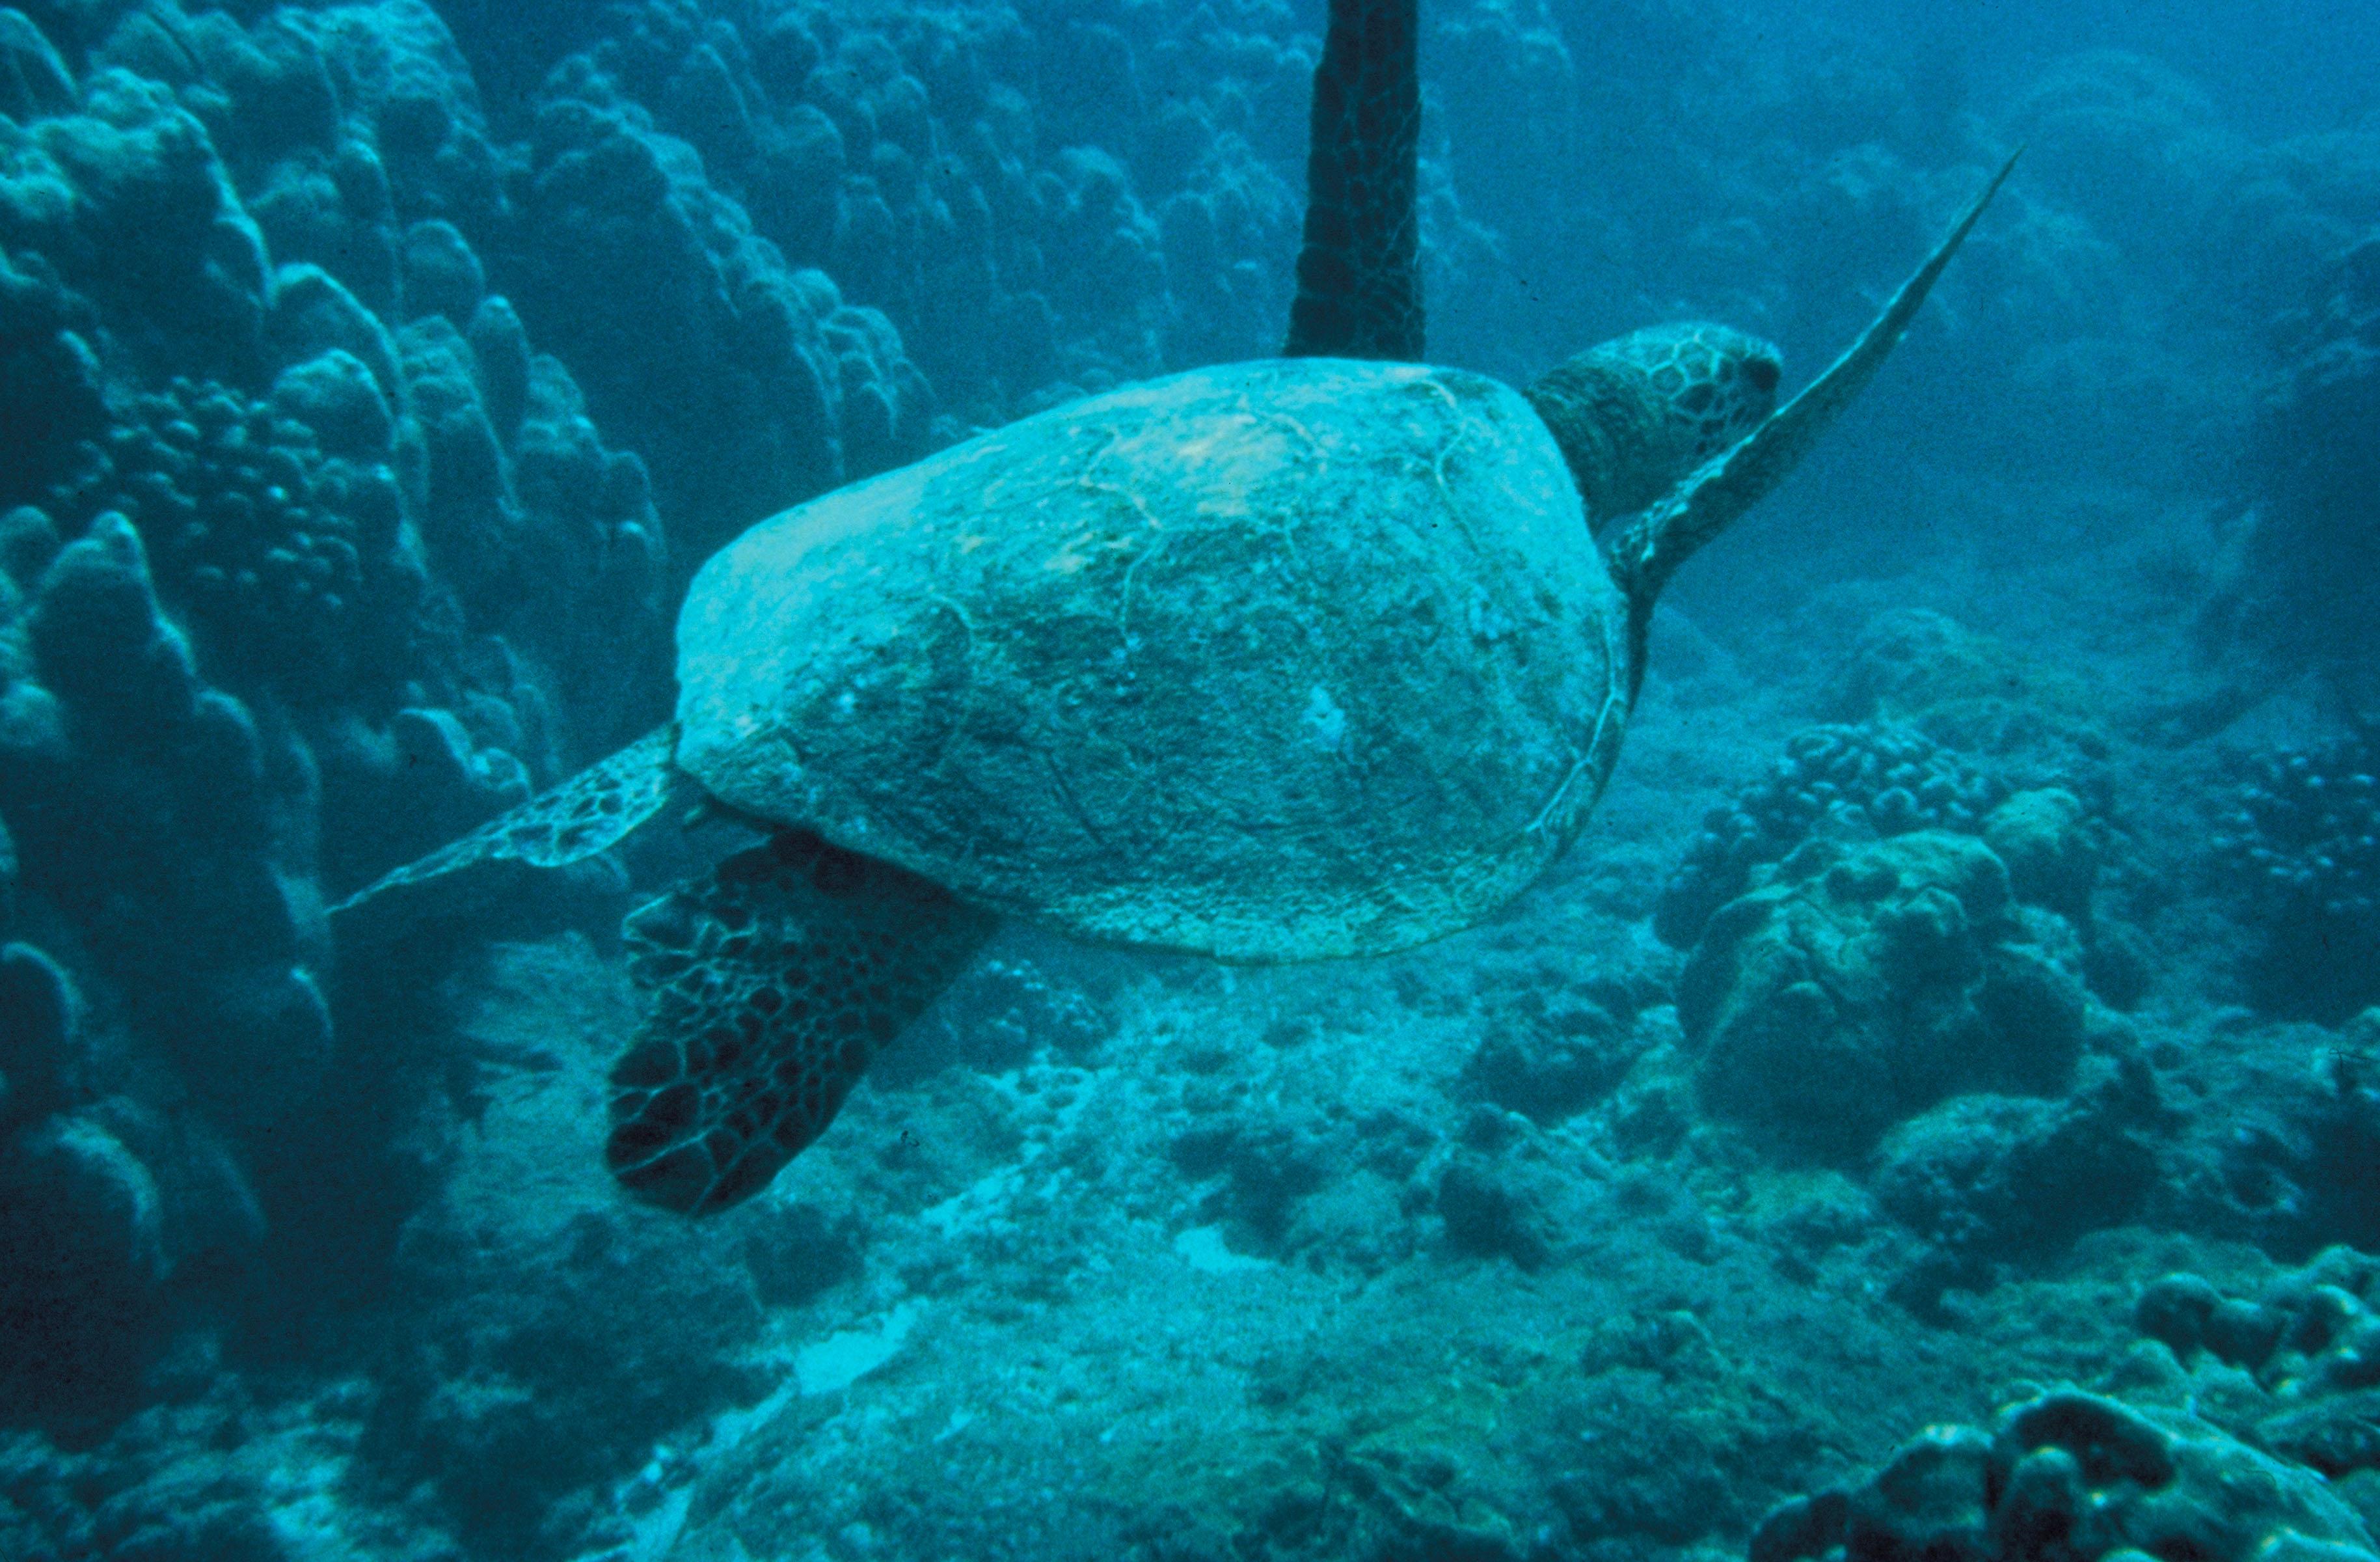 https://upload.wikimedia.org/wikipedia/commons/f/f3/Green-sea-turtle.jpg